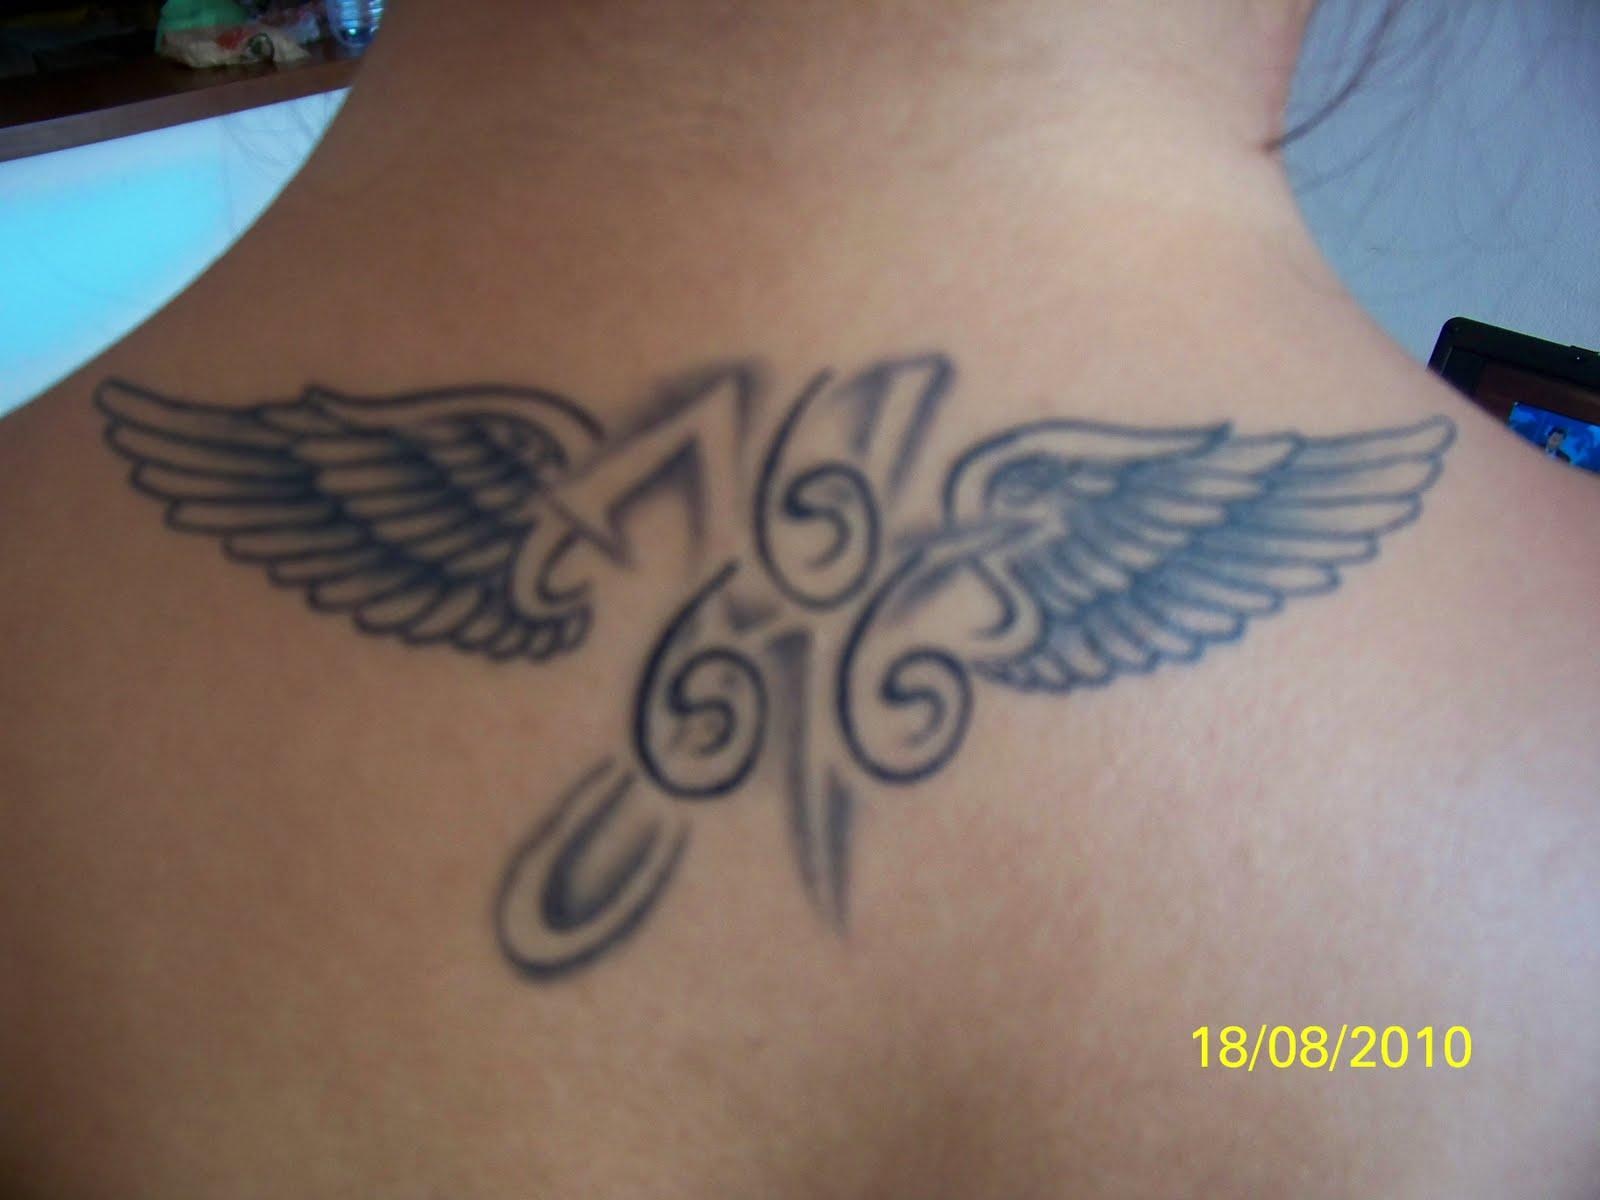 666 Tattoos - Spain: classified-blog.com/photogms/tattoos-666